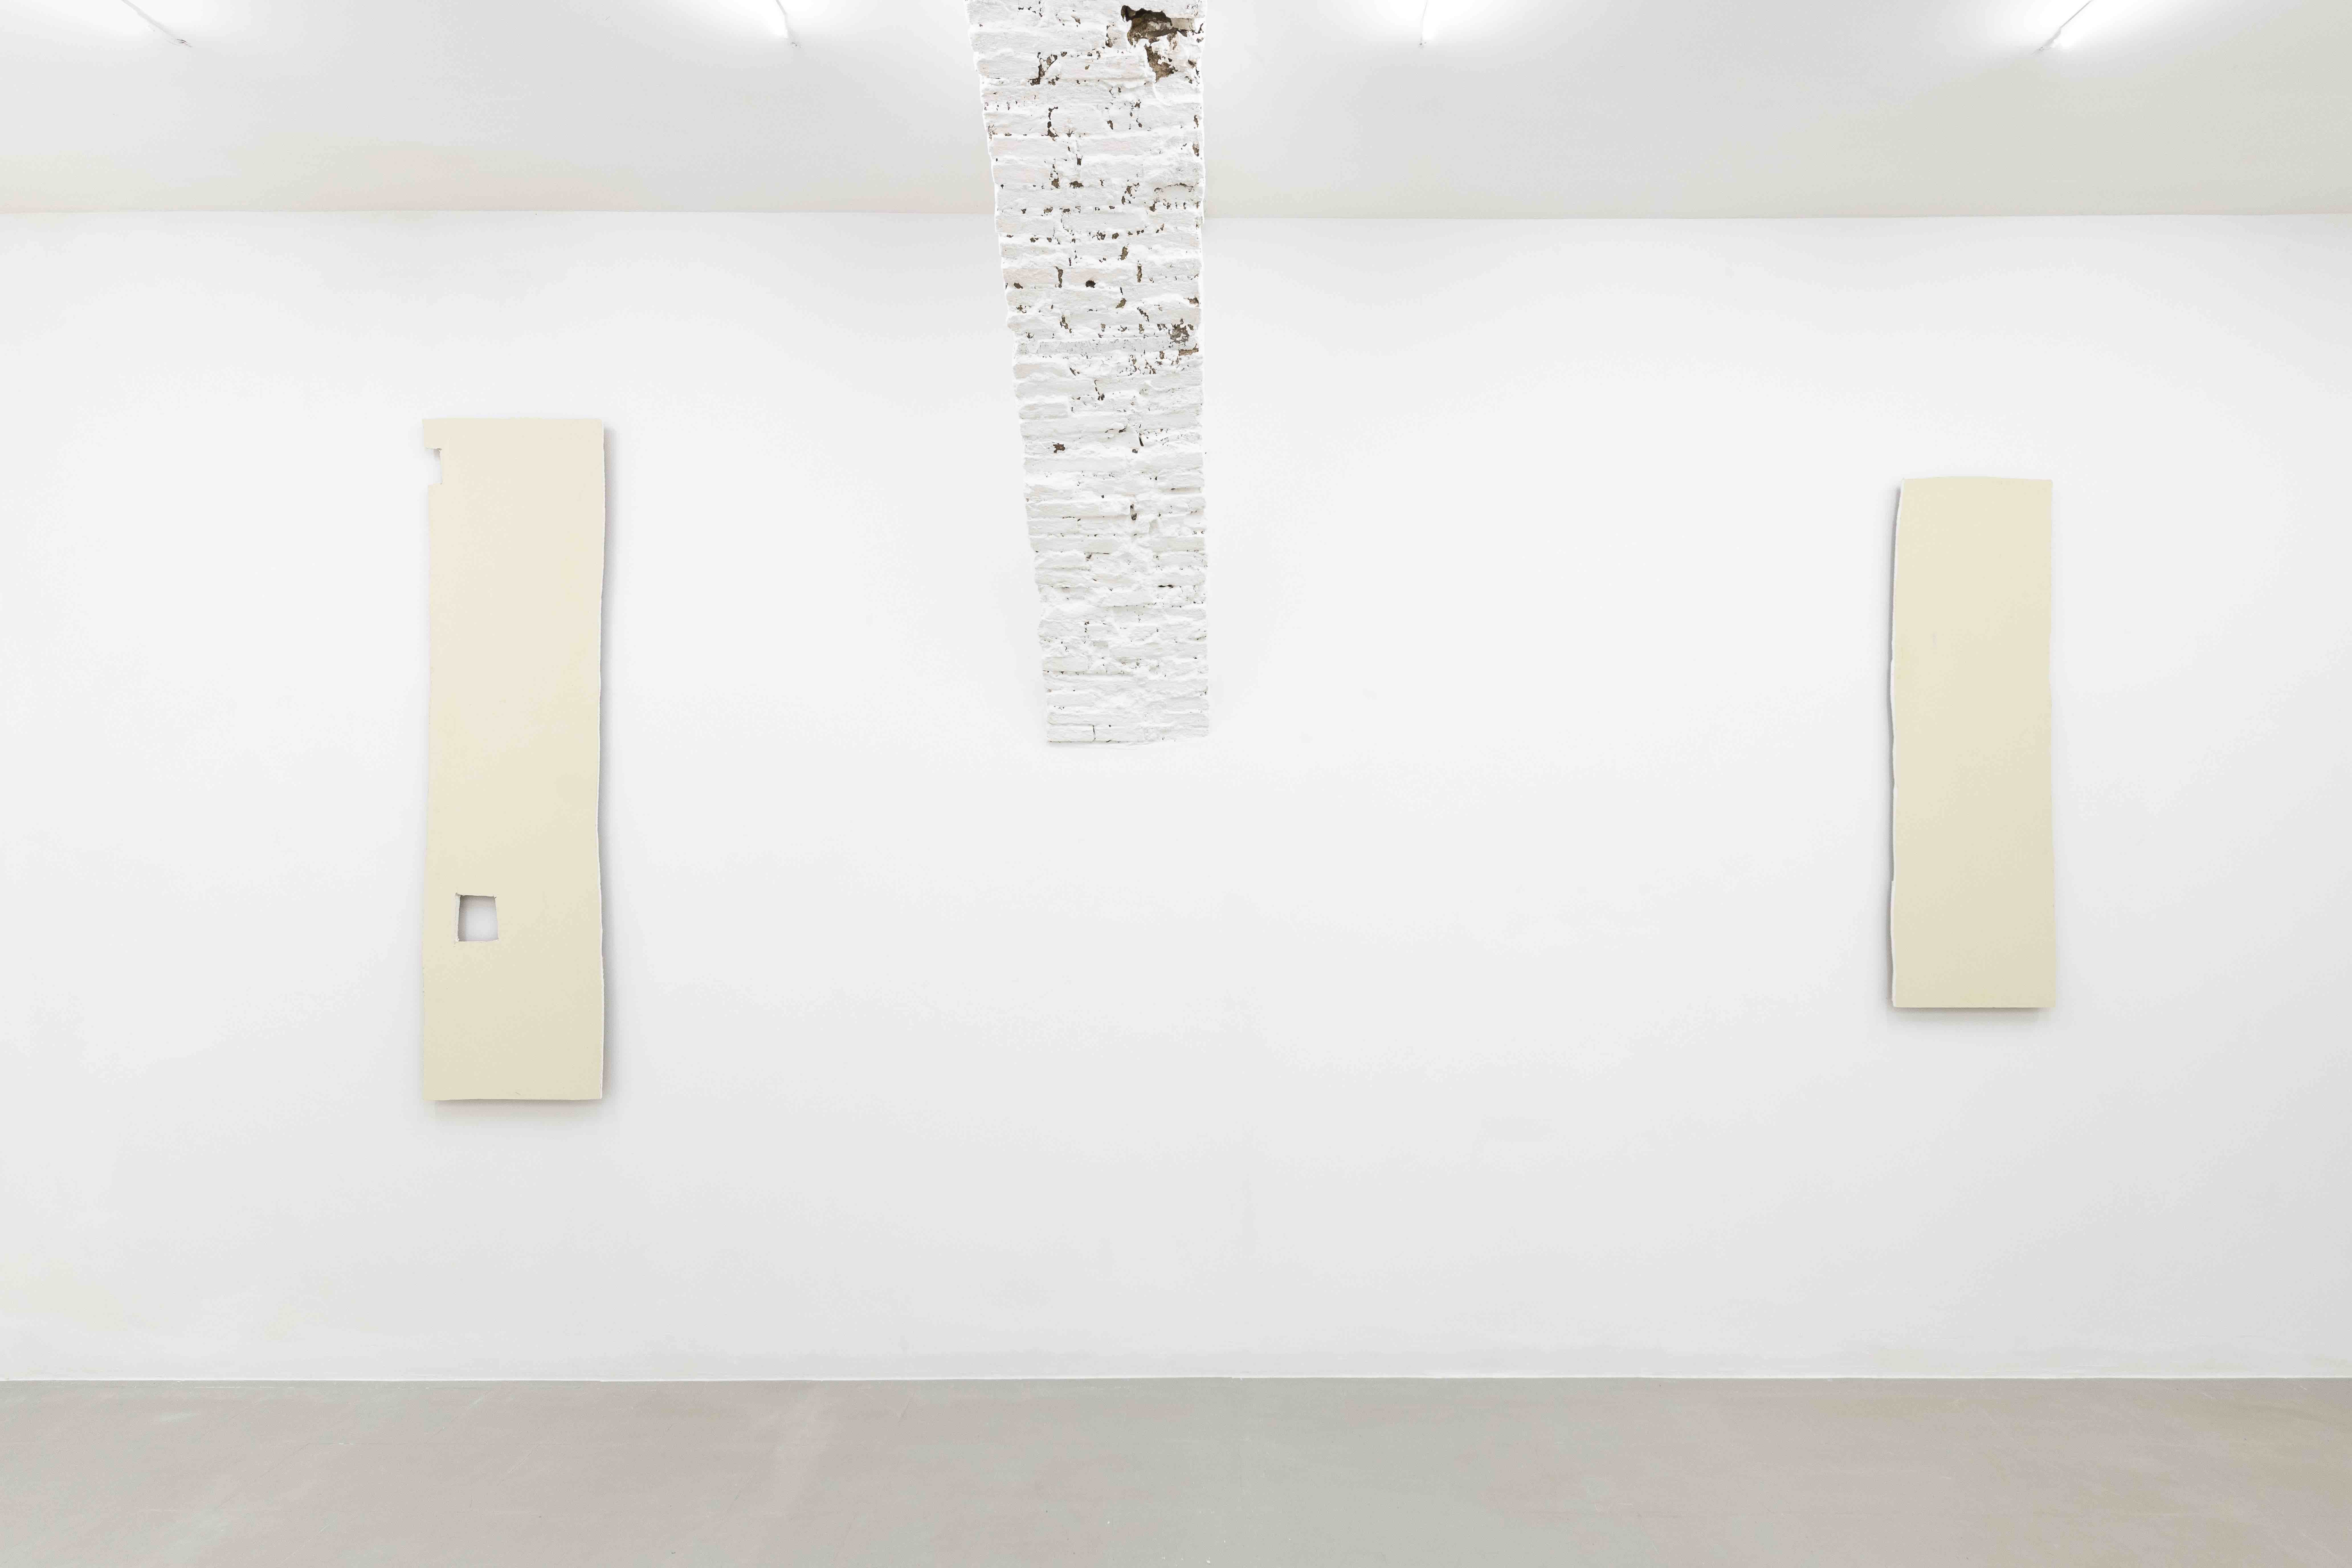 Plamen Dejanoff, 2019, Installation view, Galerie Emanuel Layr Rome, Photo: Giorgio Benni